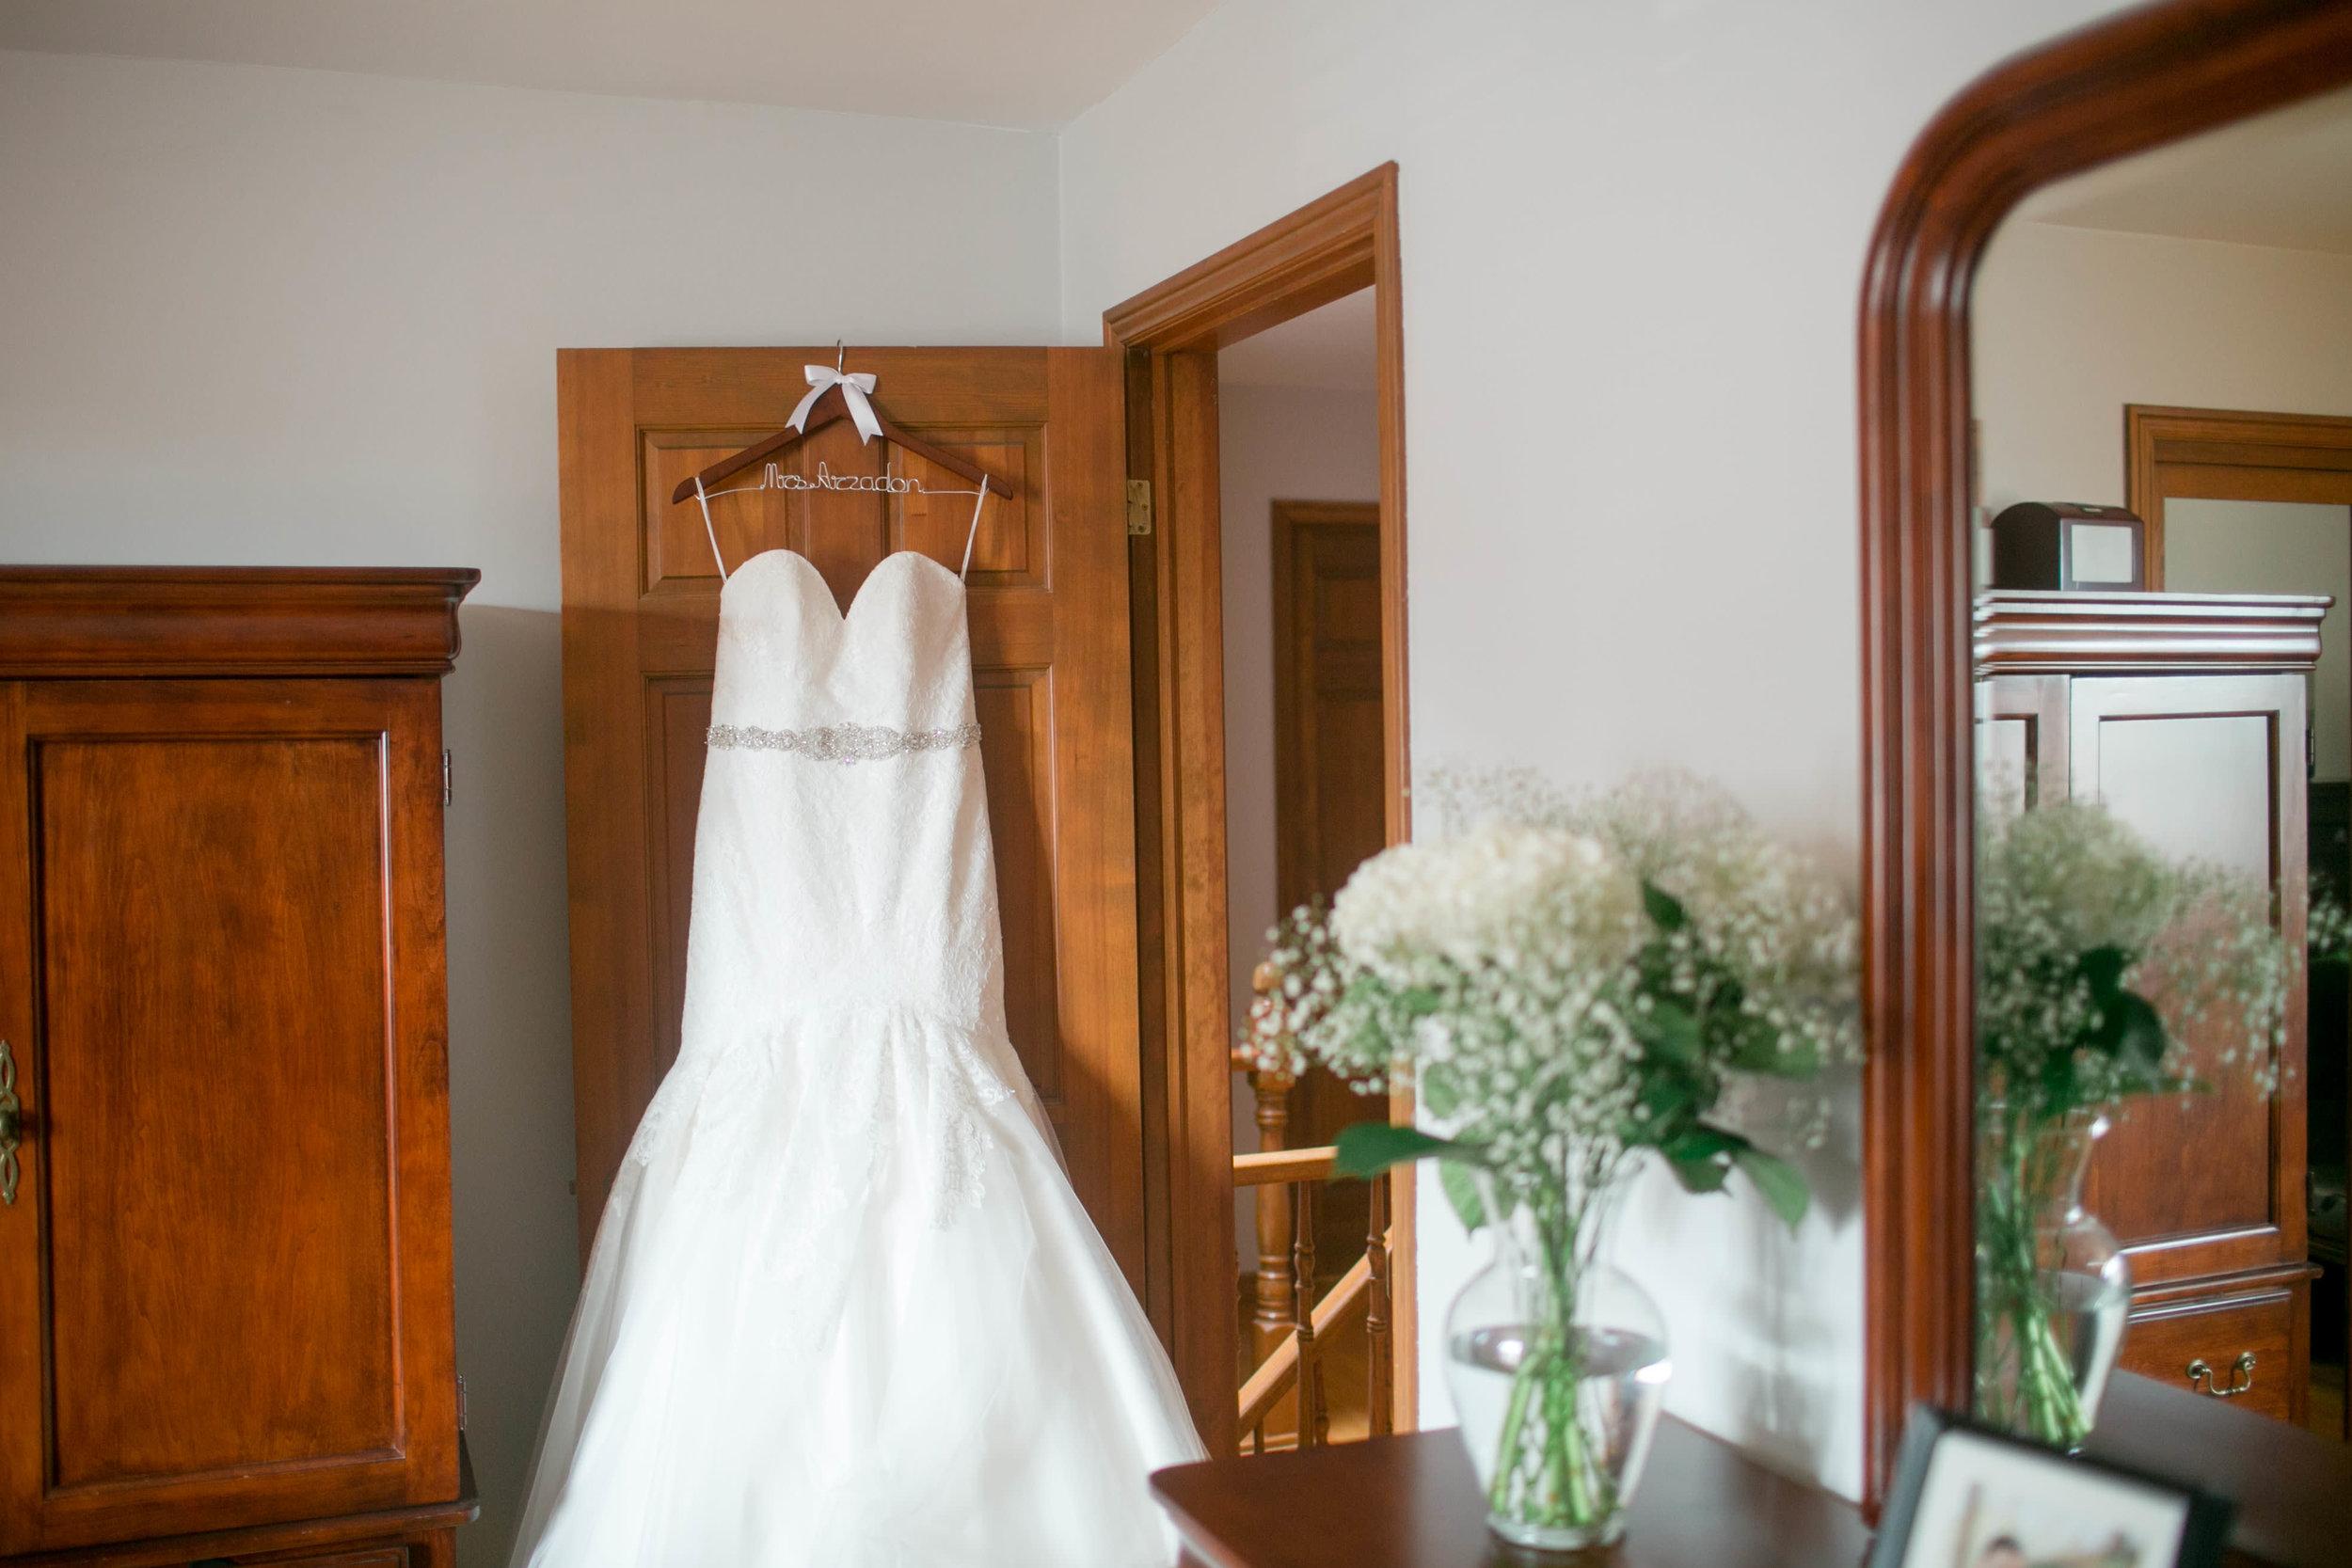 Stefanie___Bernard___Daniel_Ricci_Weddings_High_Res._Finals__023.jpg